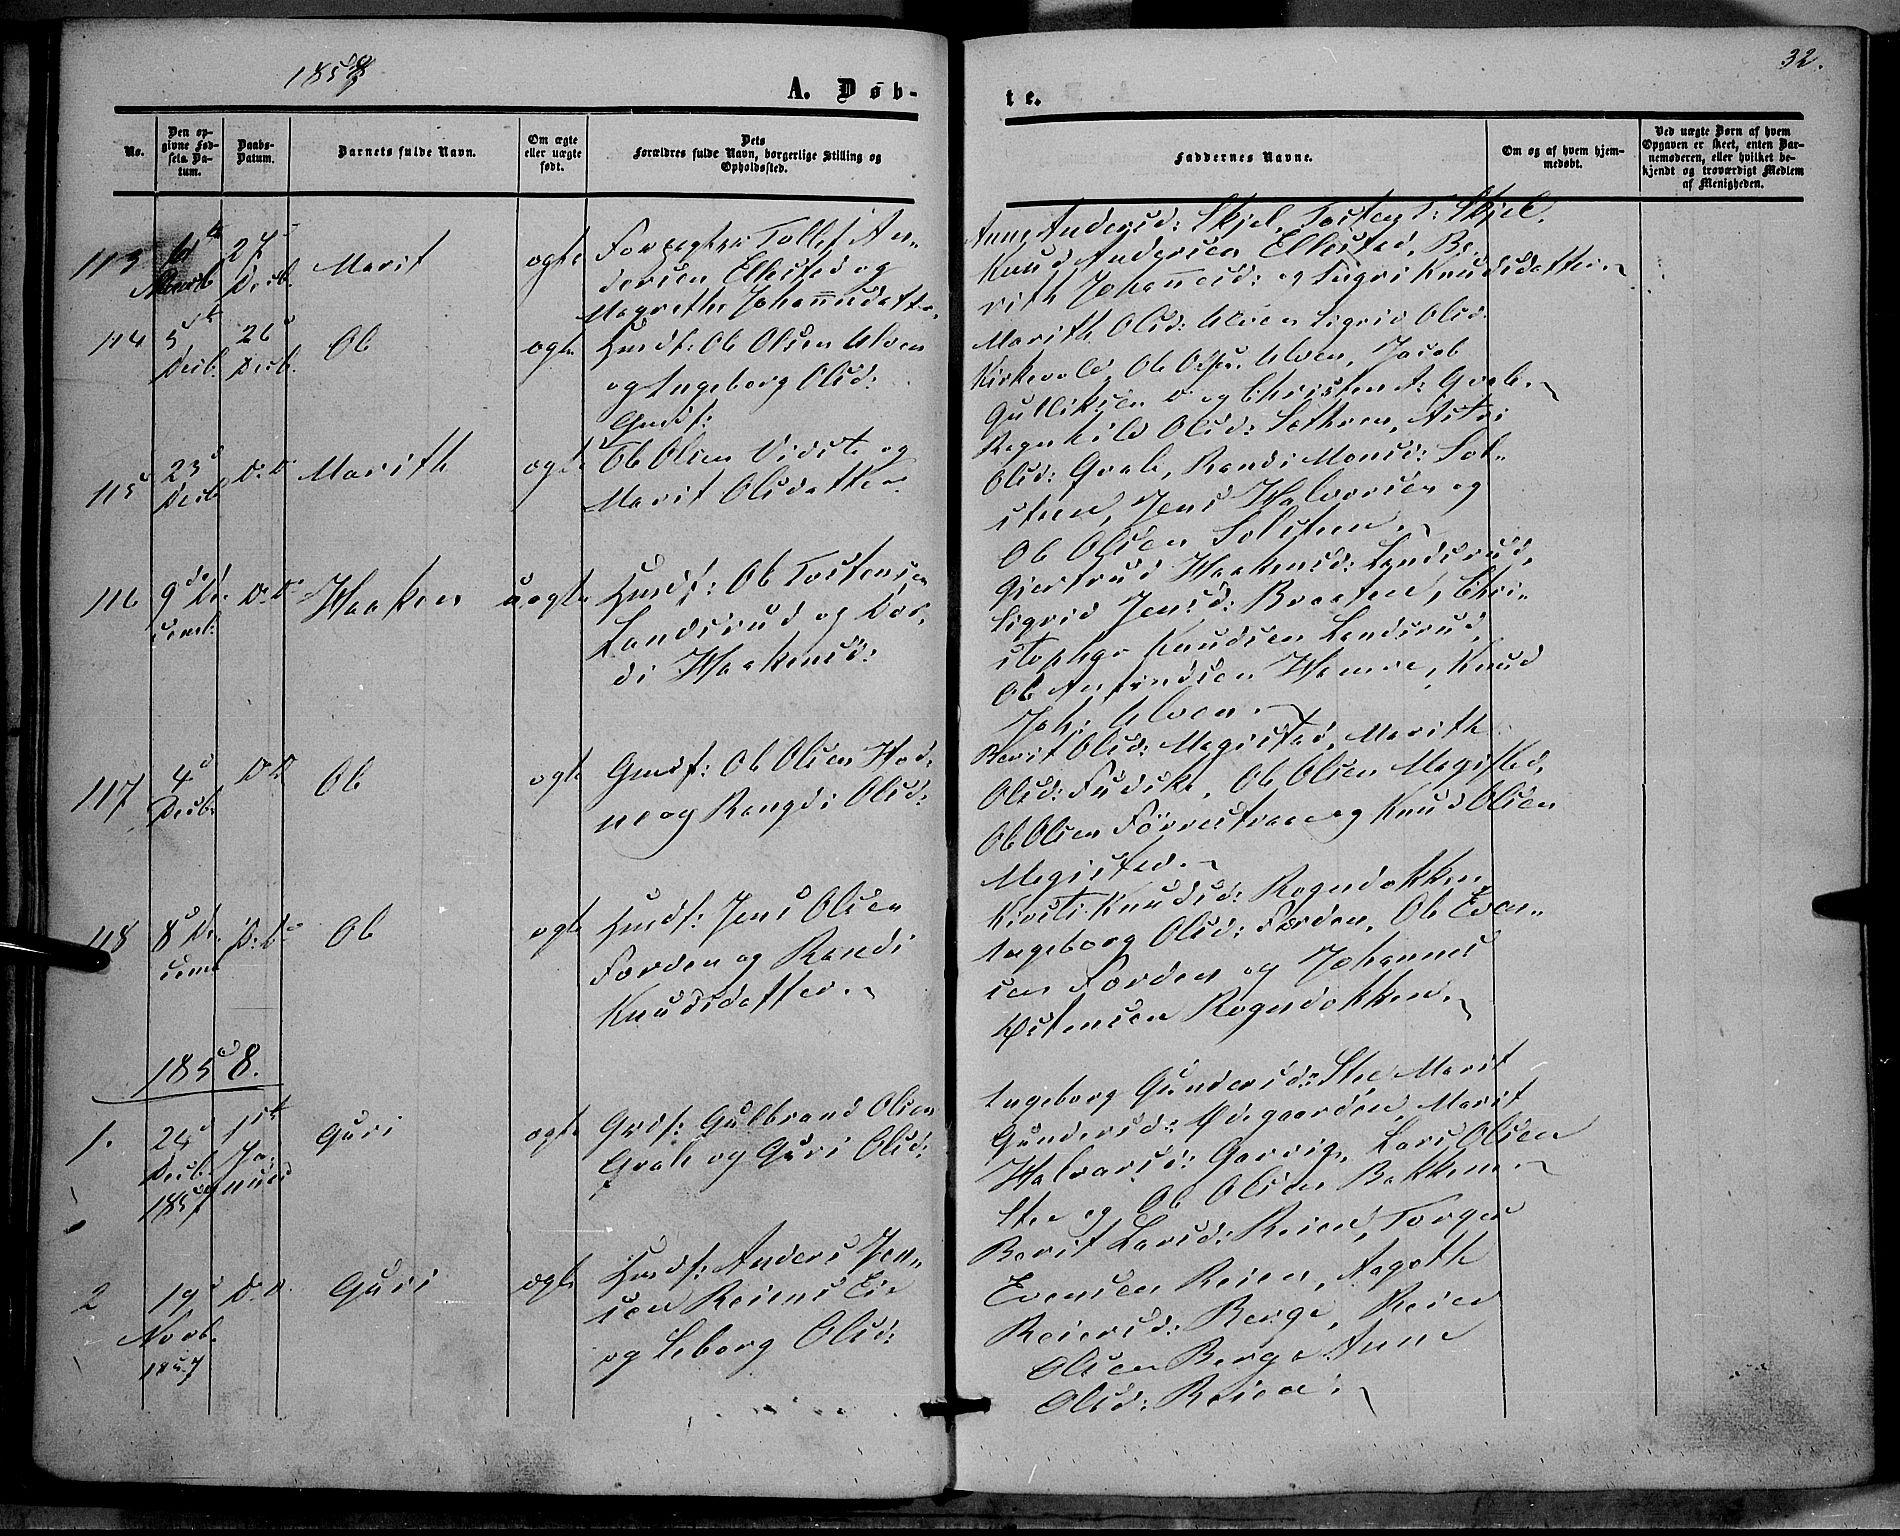 SAH, Vestre Slidre prestekontor, Ministerialbok nr. 2, 1856-1864, s. 32